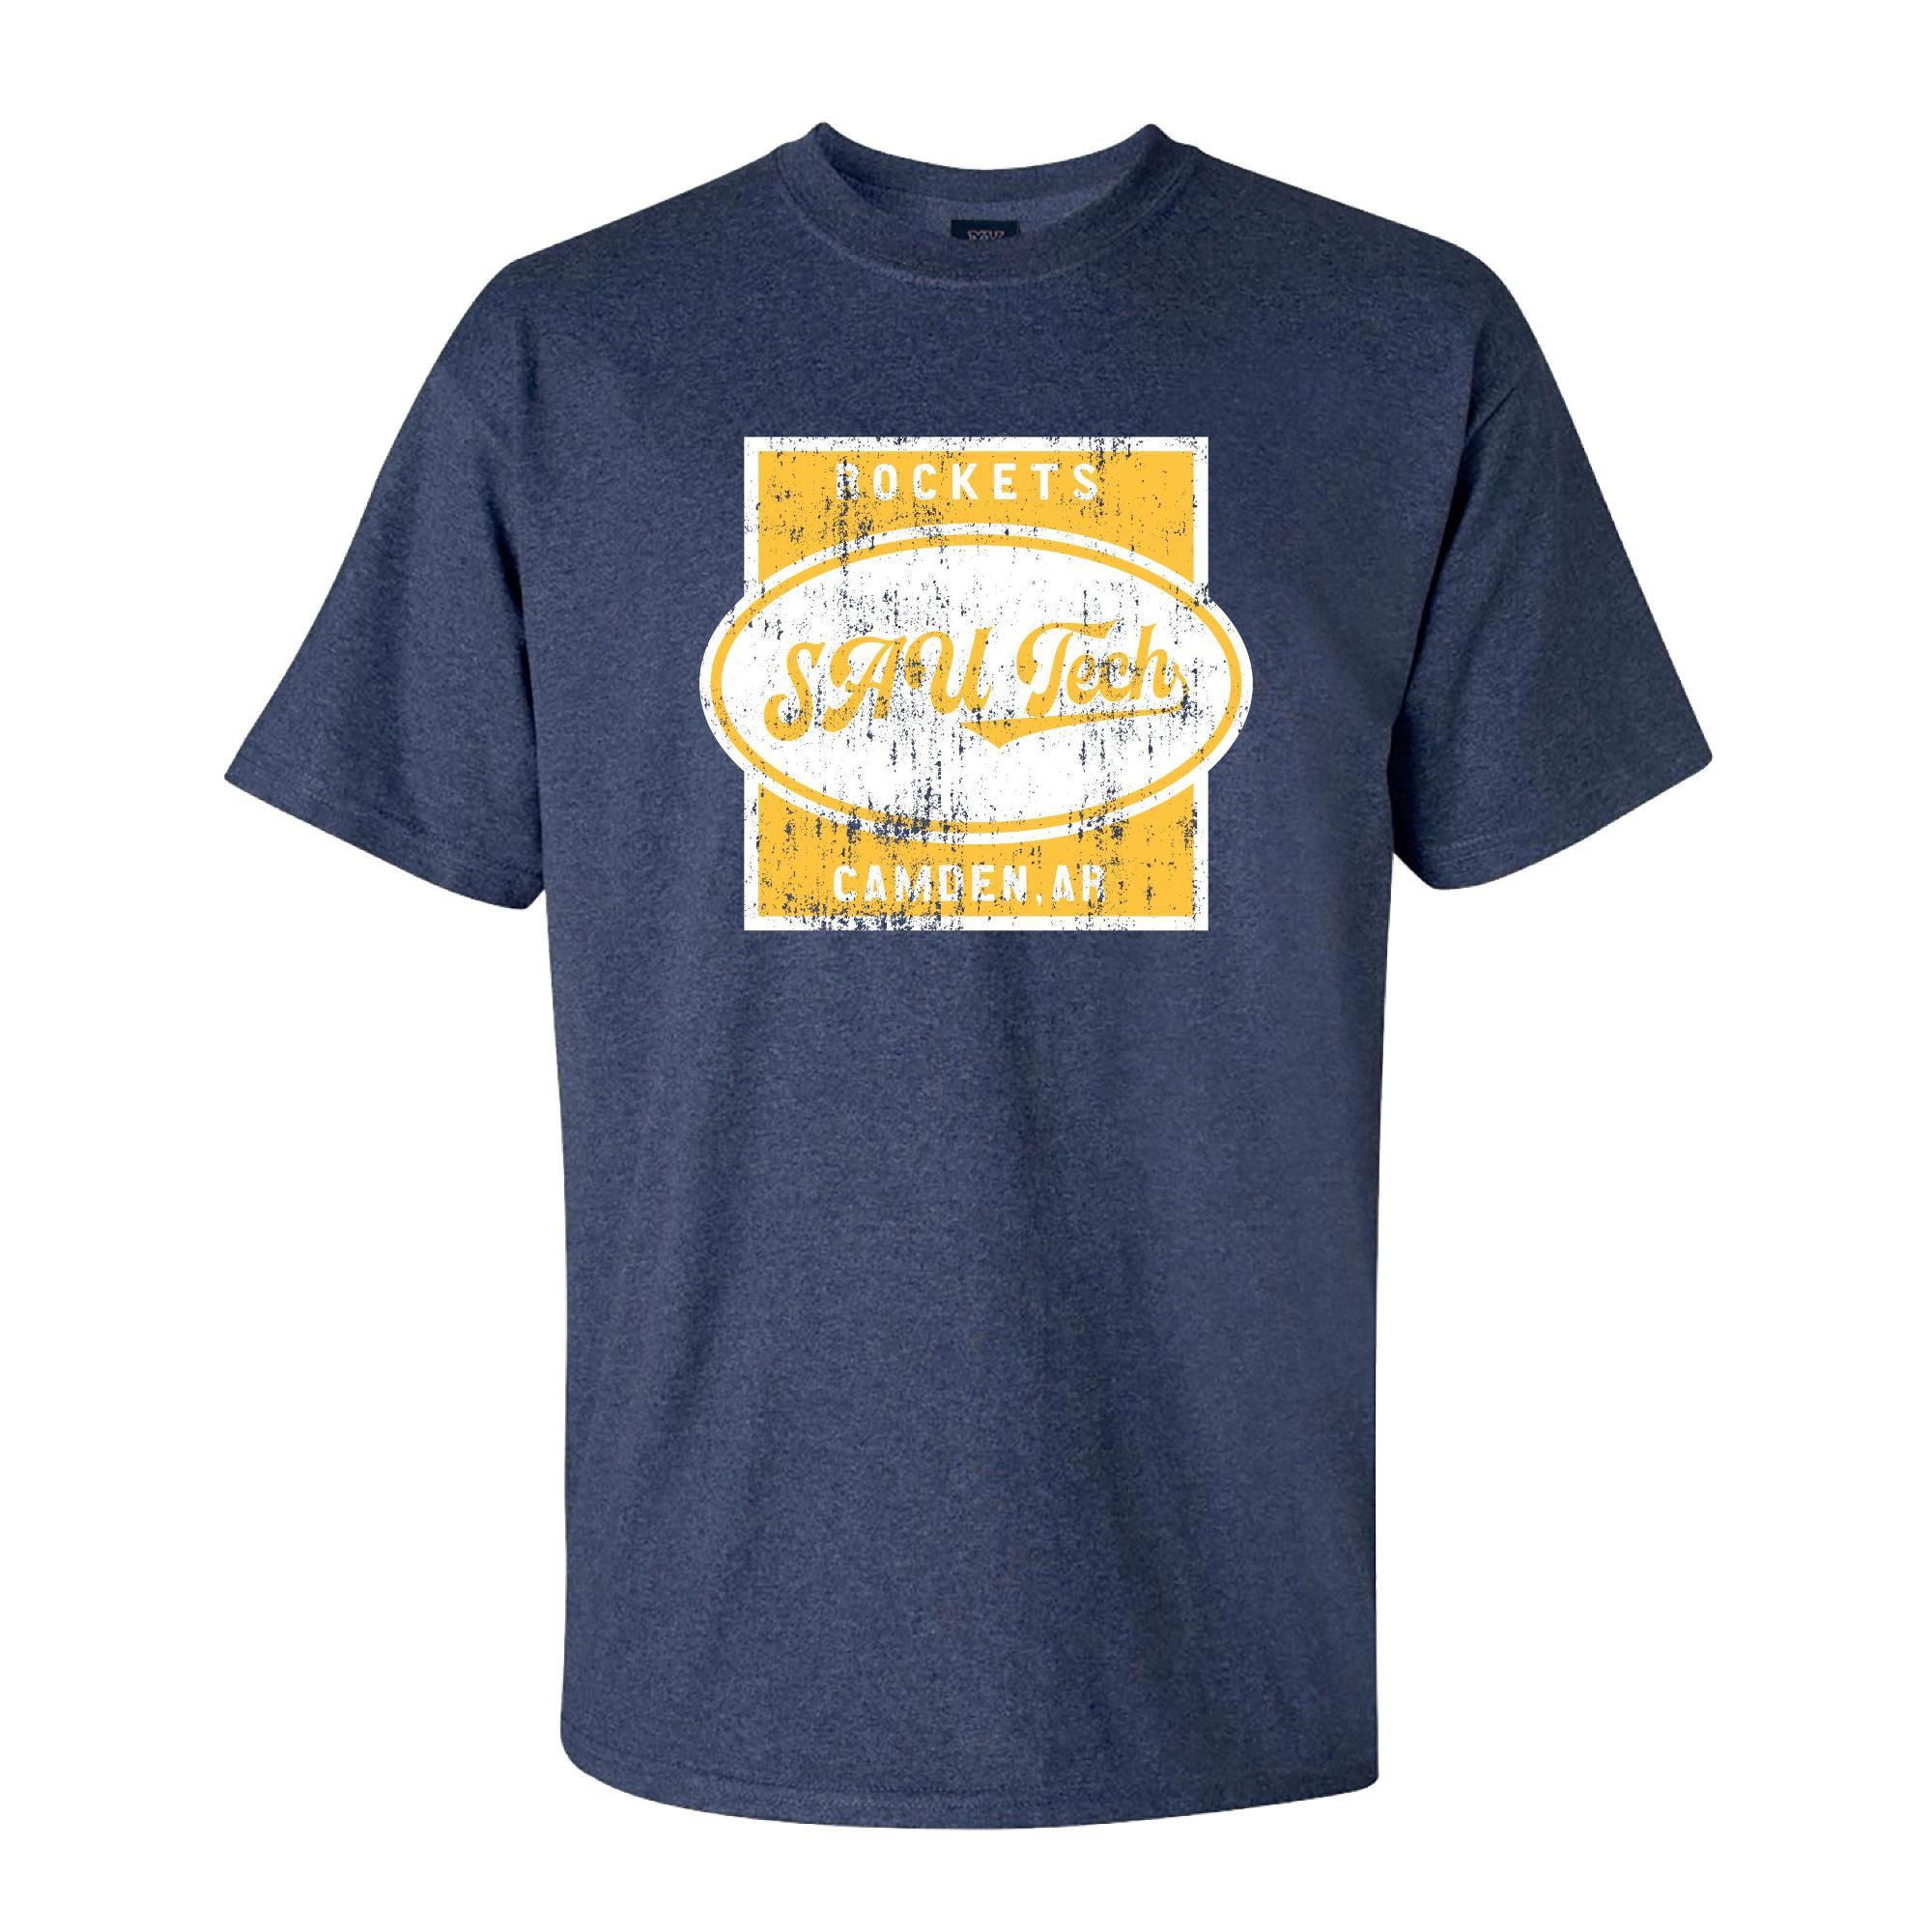 image of: SAU Tech Rockets Camden, AR Classic T-shirt